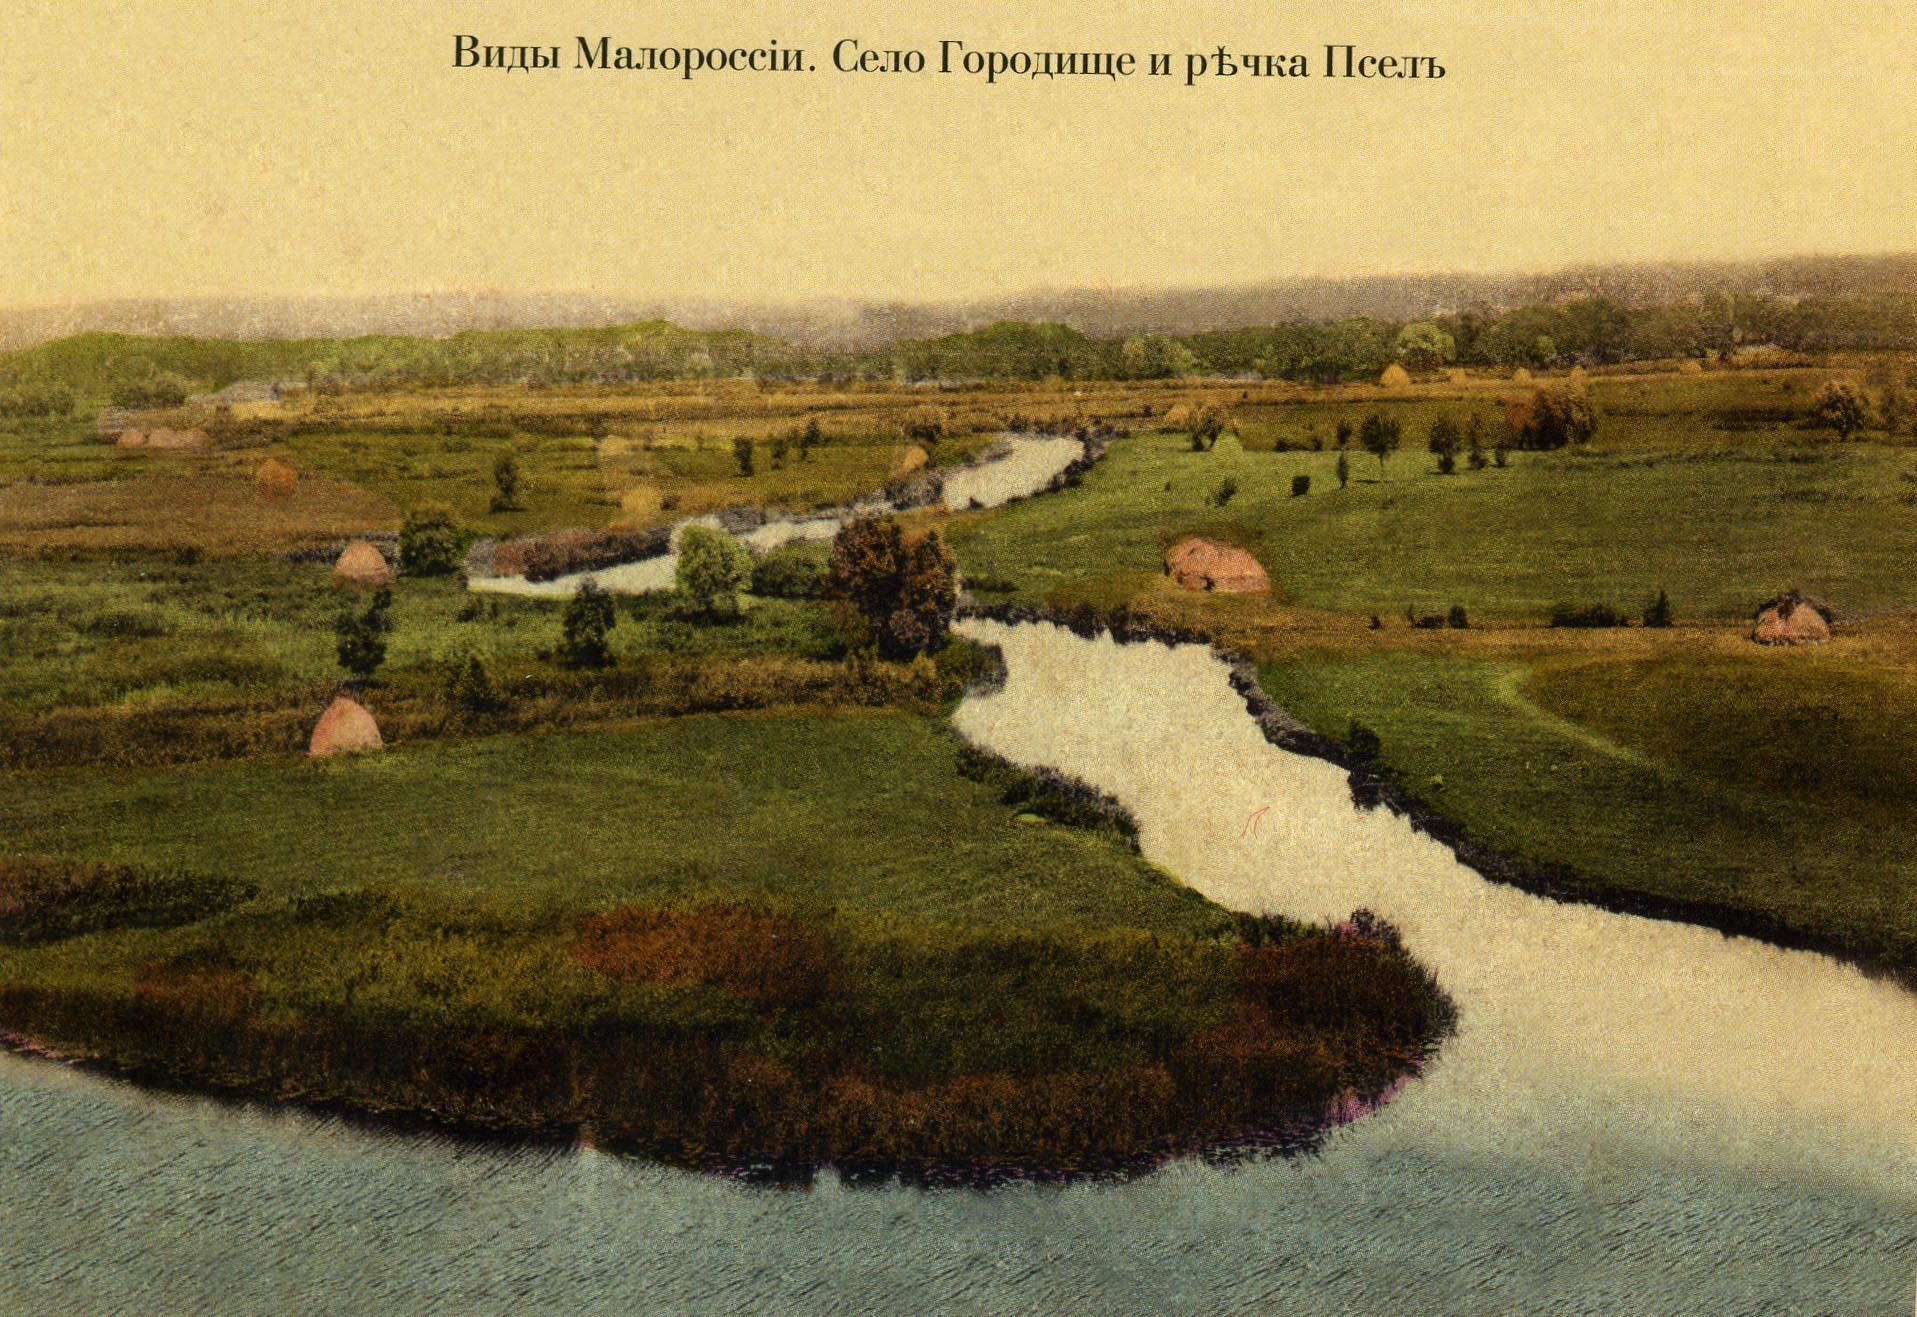 Окрестности Сум. Село Городище и река Псел